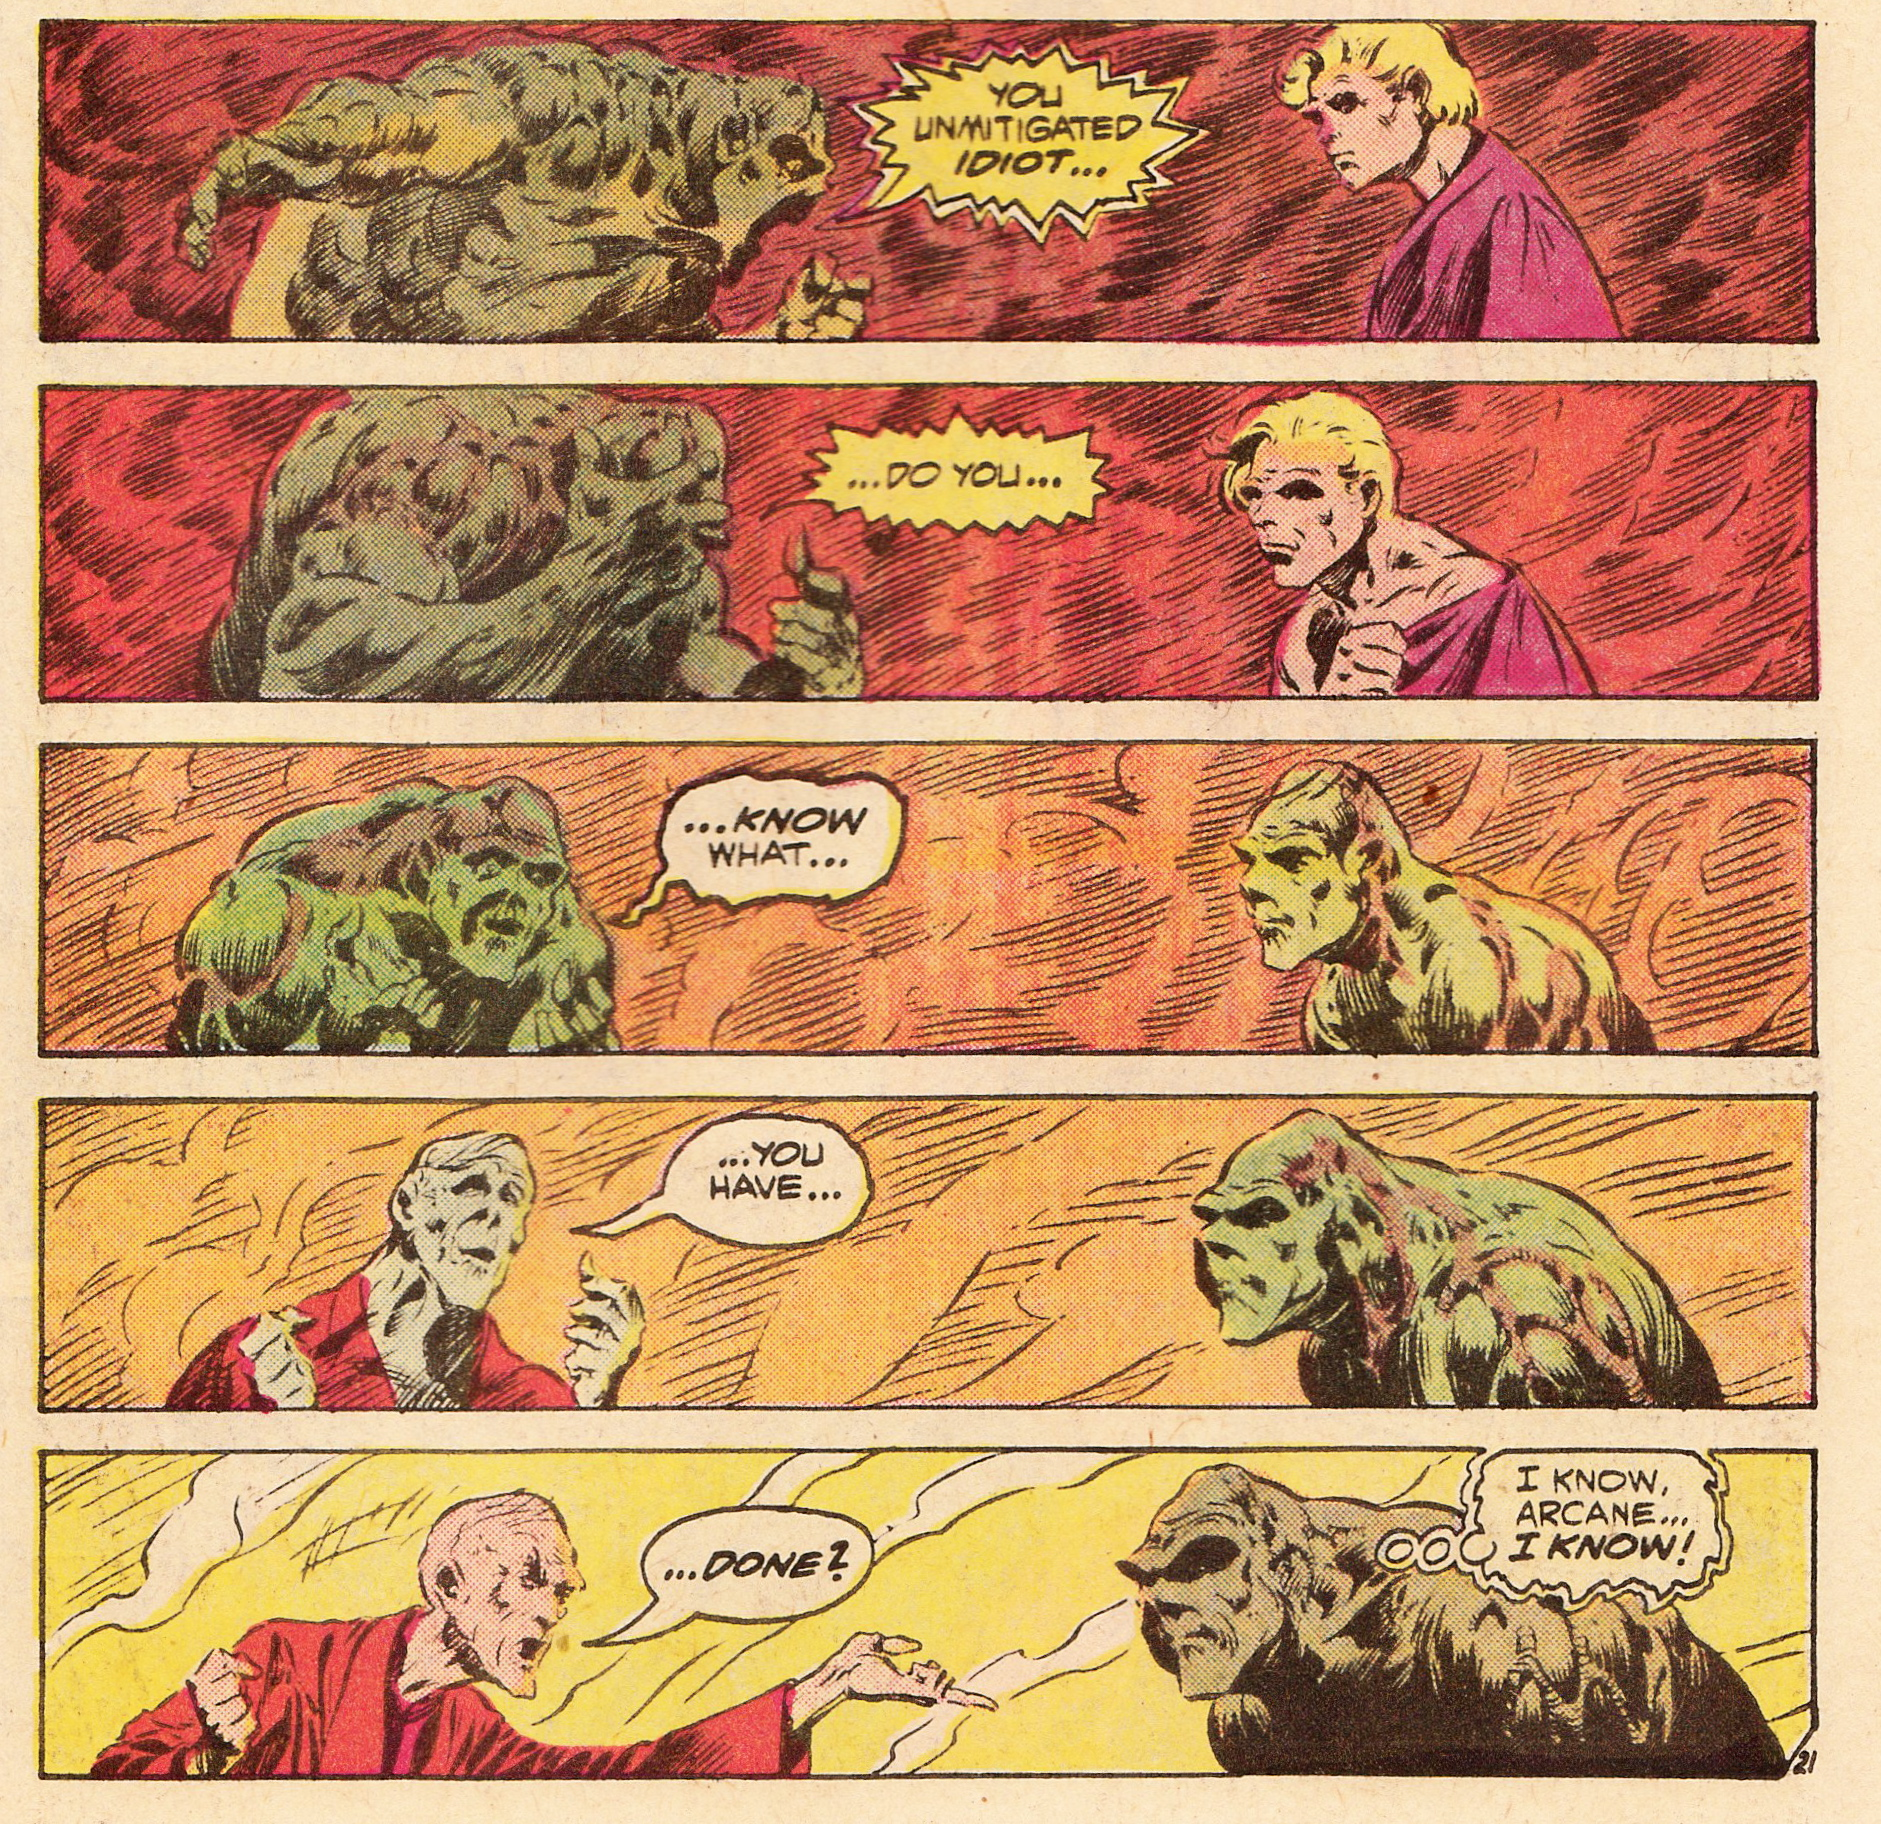 Swamp Thing #2, Len Wein & Bernie Wrightson | Longbox Graveyard